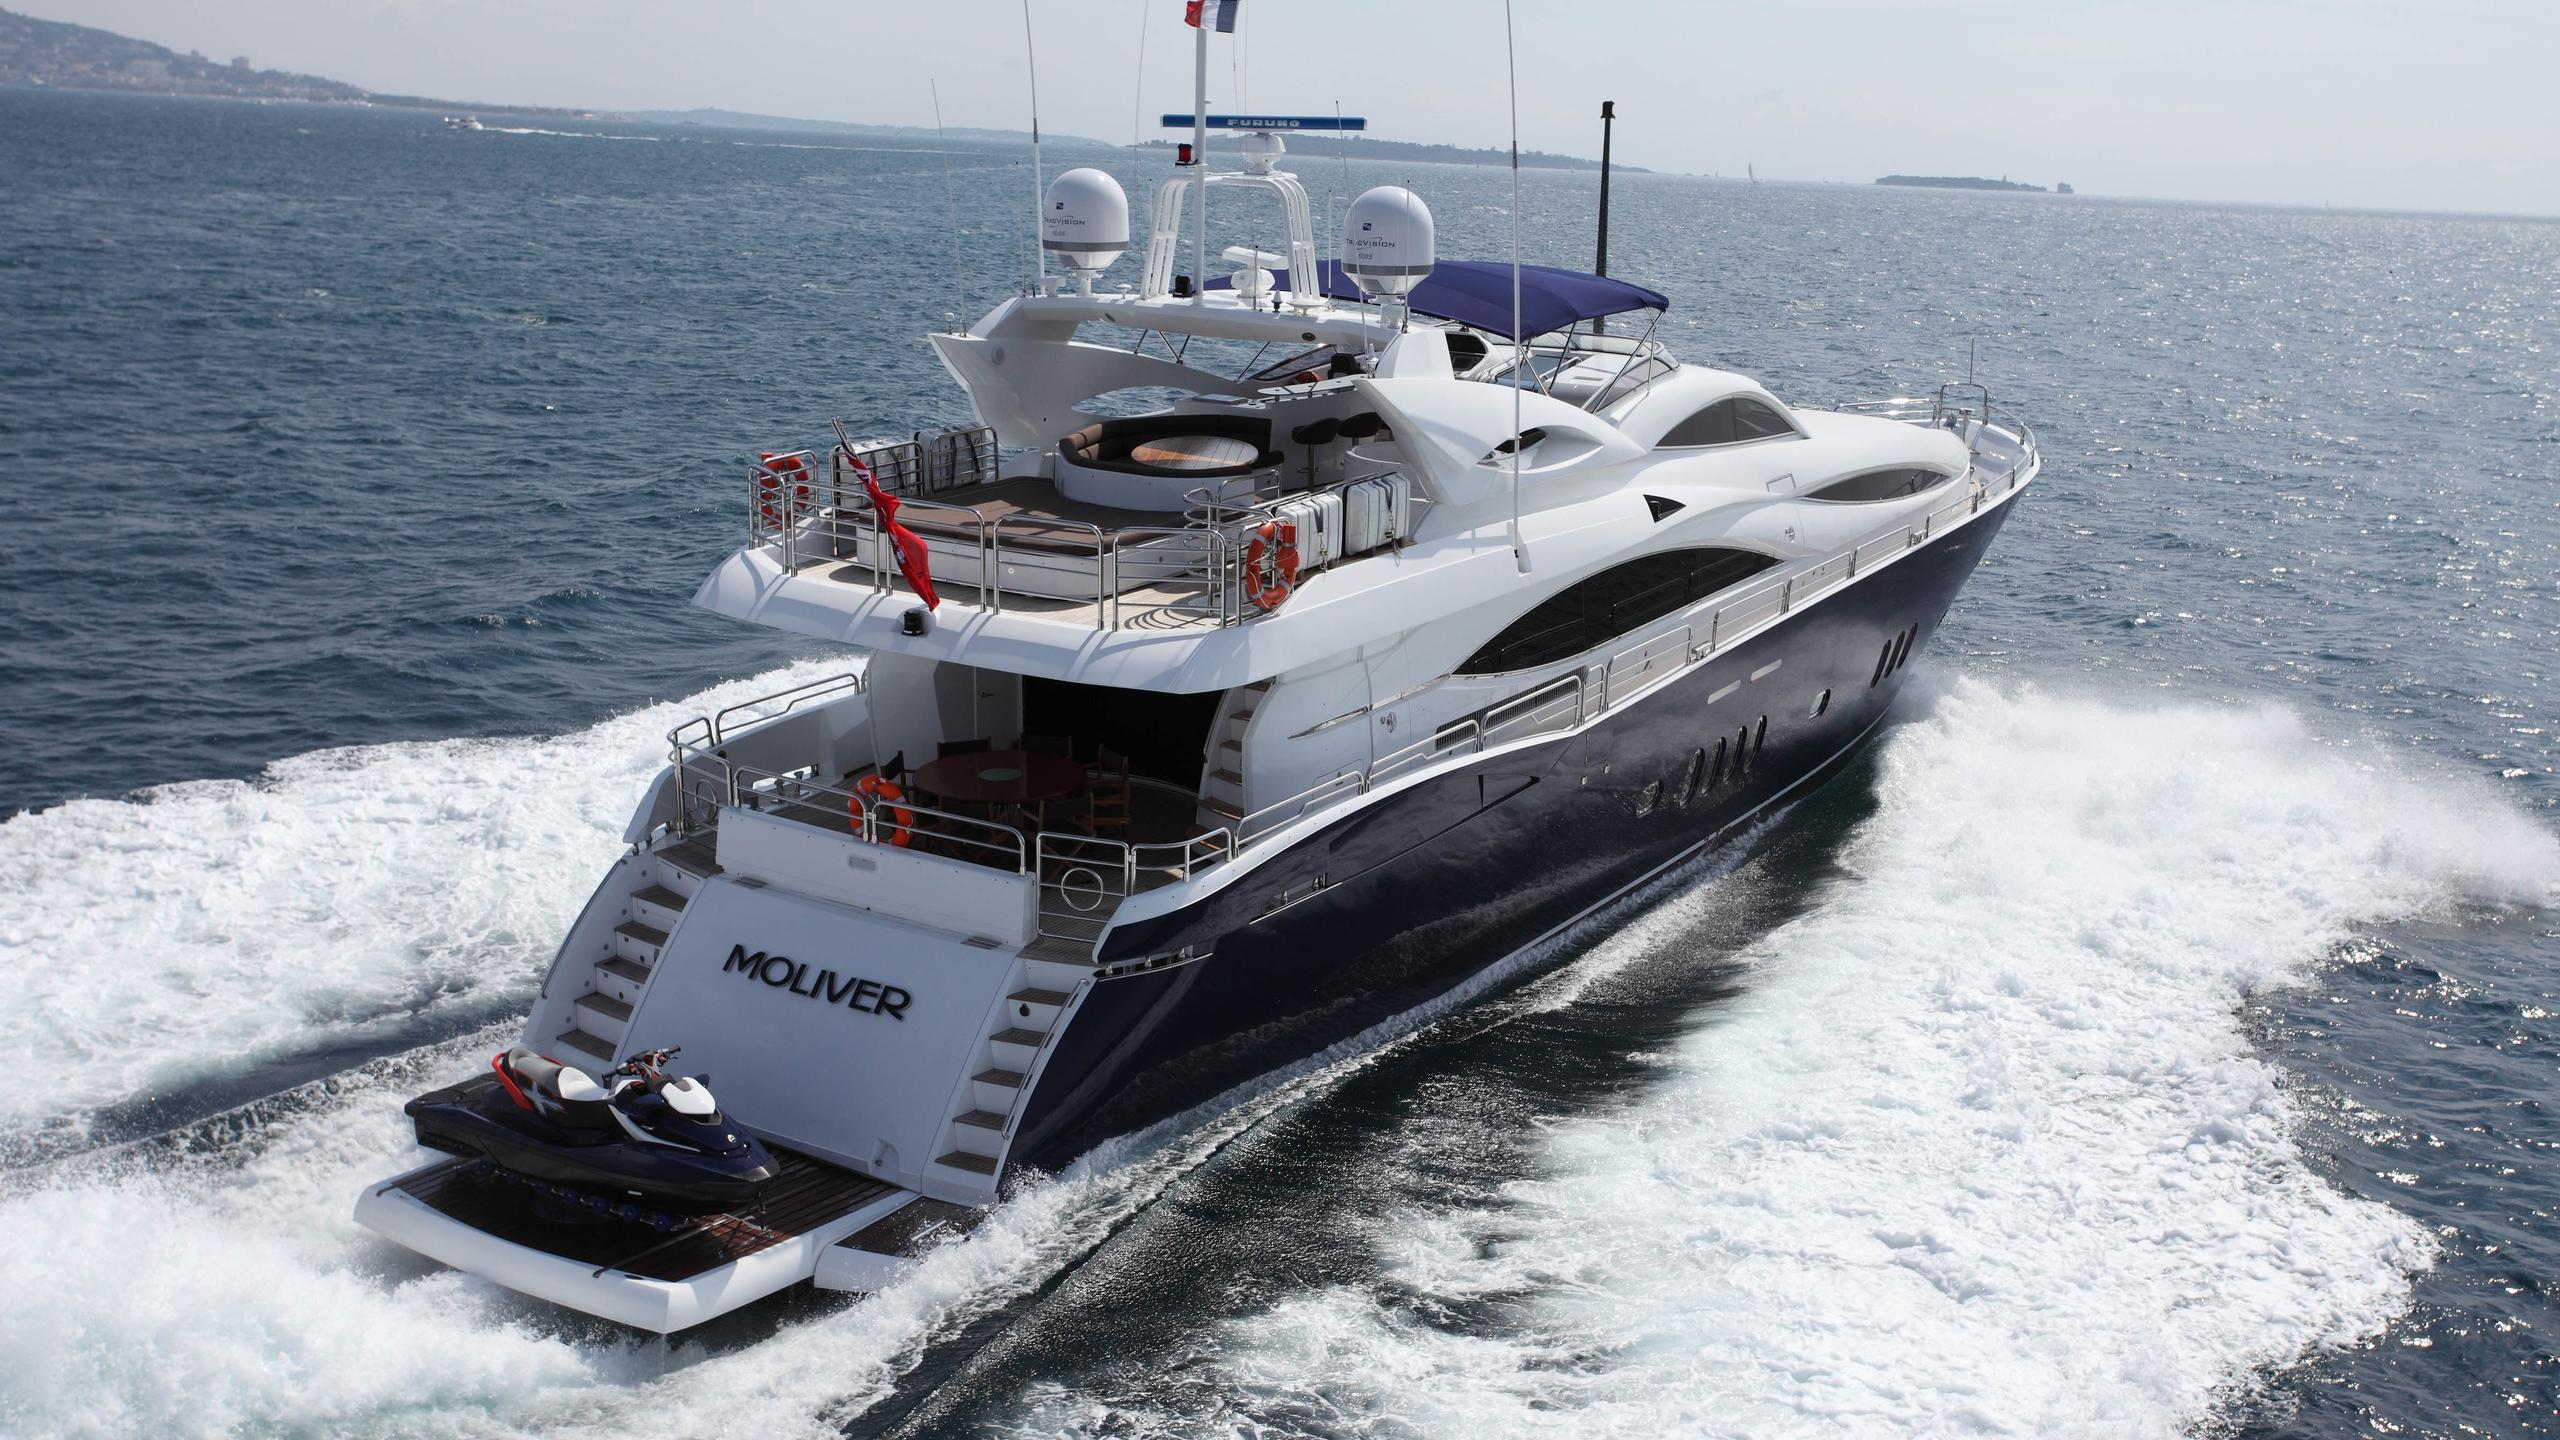 moliver-yacht-running